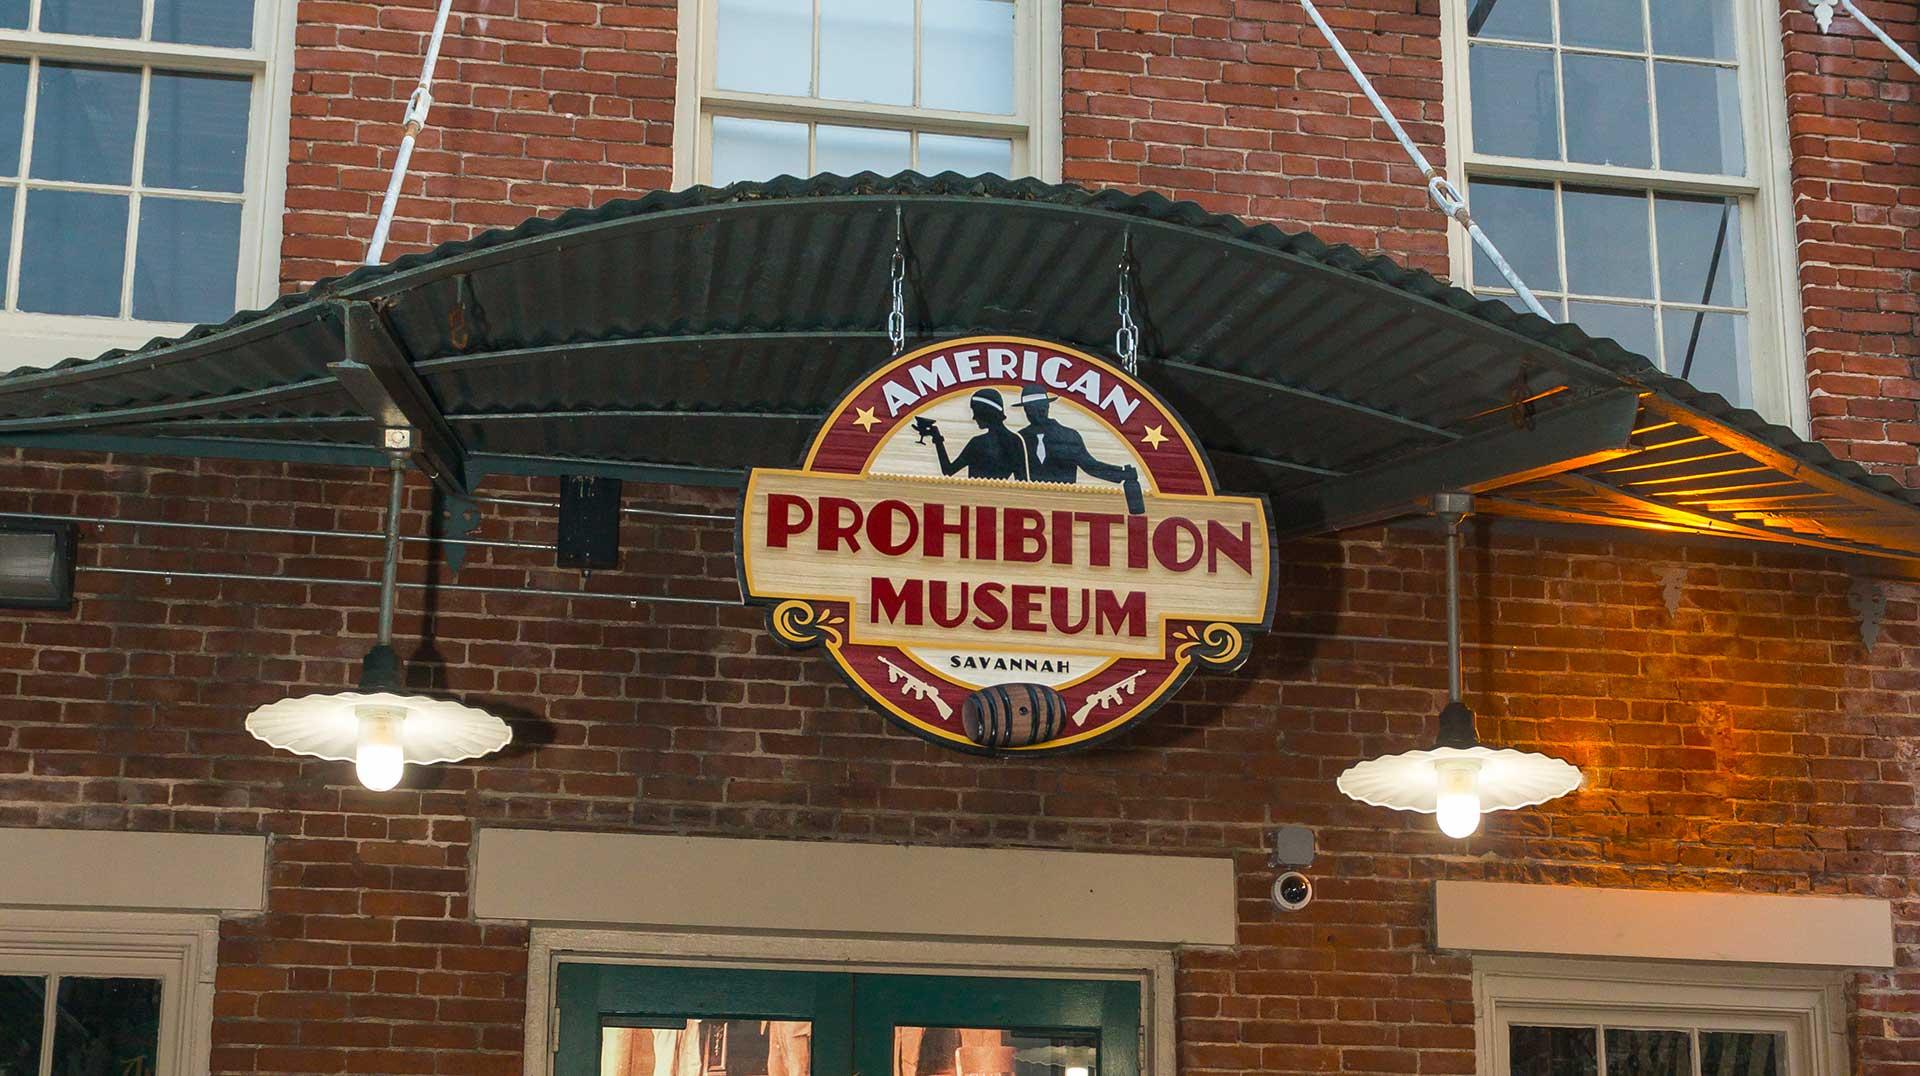 American Prohibition Museum savannah.jpg